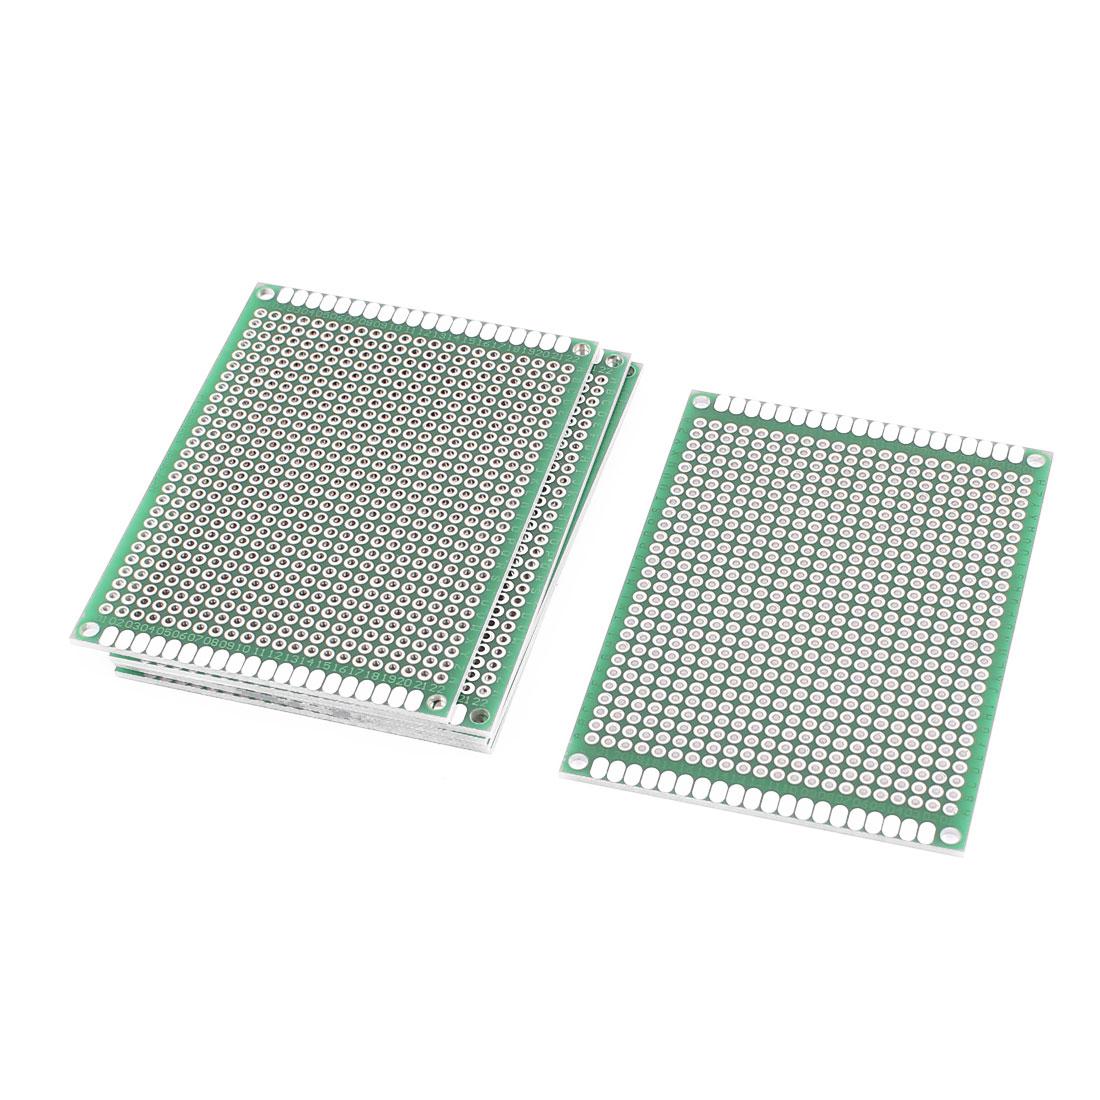 6Pcs Double-Side Prototype Solderable Paper Universal PCB Board 6x8cm